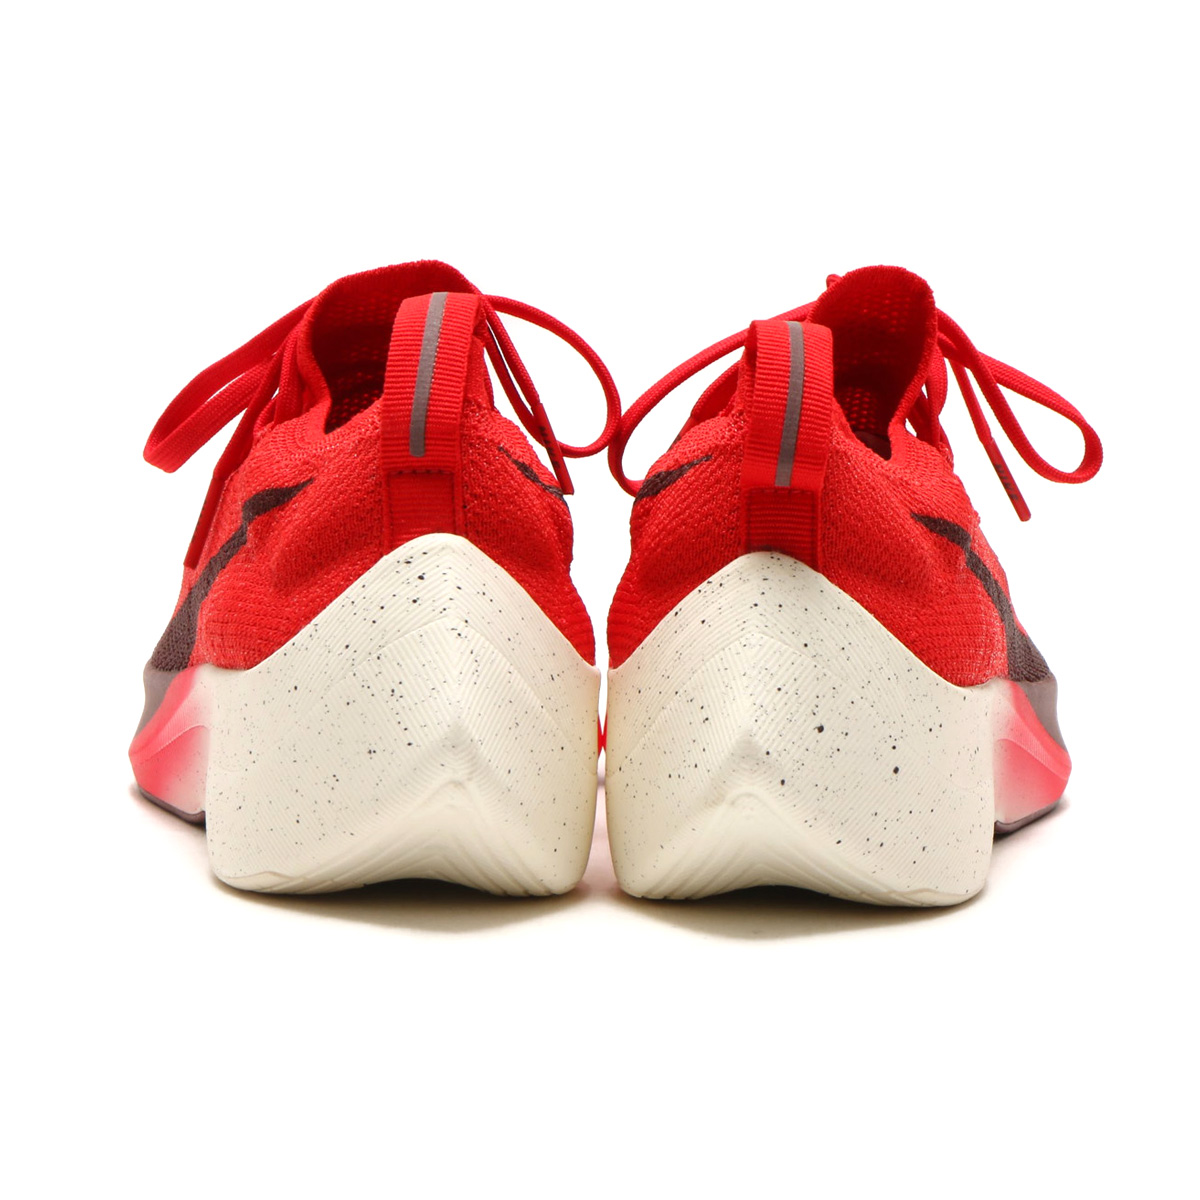 02ea4bfff449 NIKE VAPOR STREET FLYKNIT (Nike vapor street fried food knit) UNIVERSITY RED  DARK TEAM RED-SAIL-BLACK 18SP-S